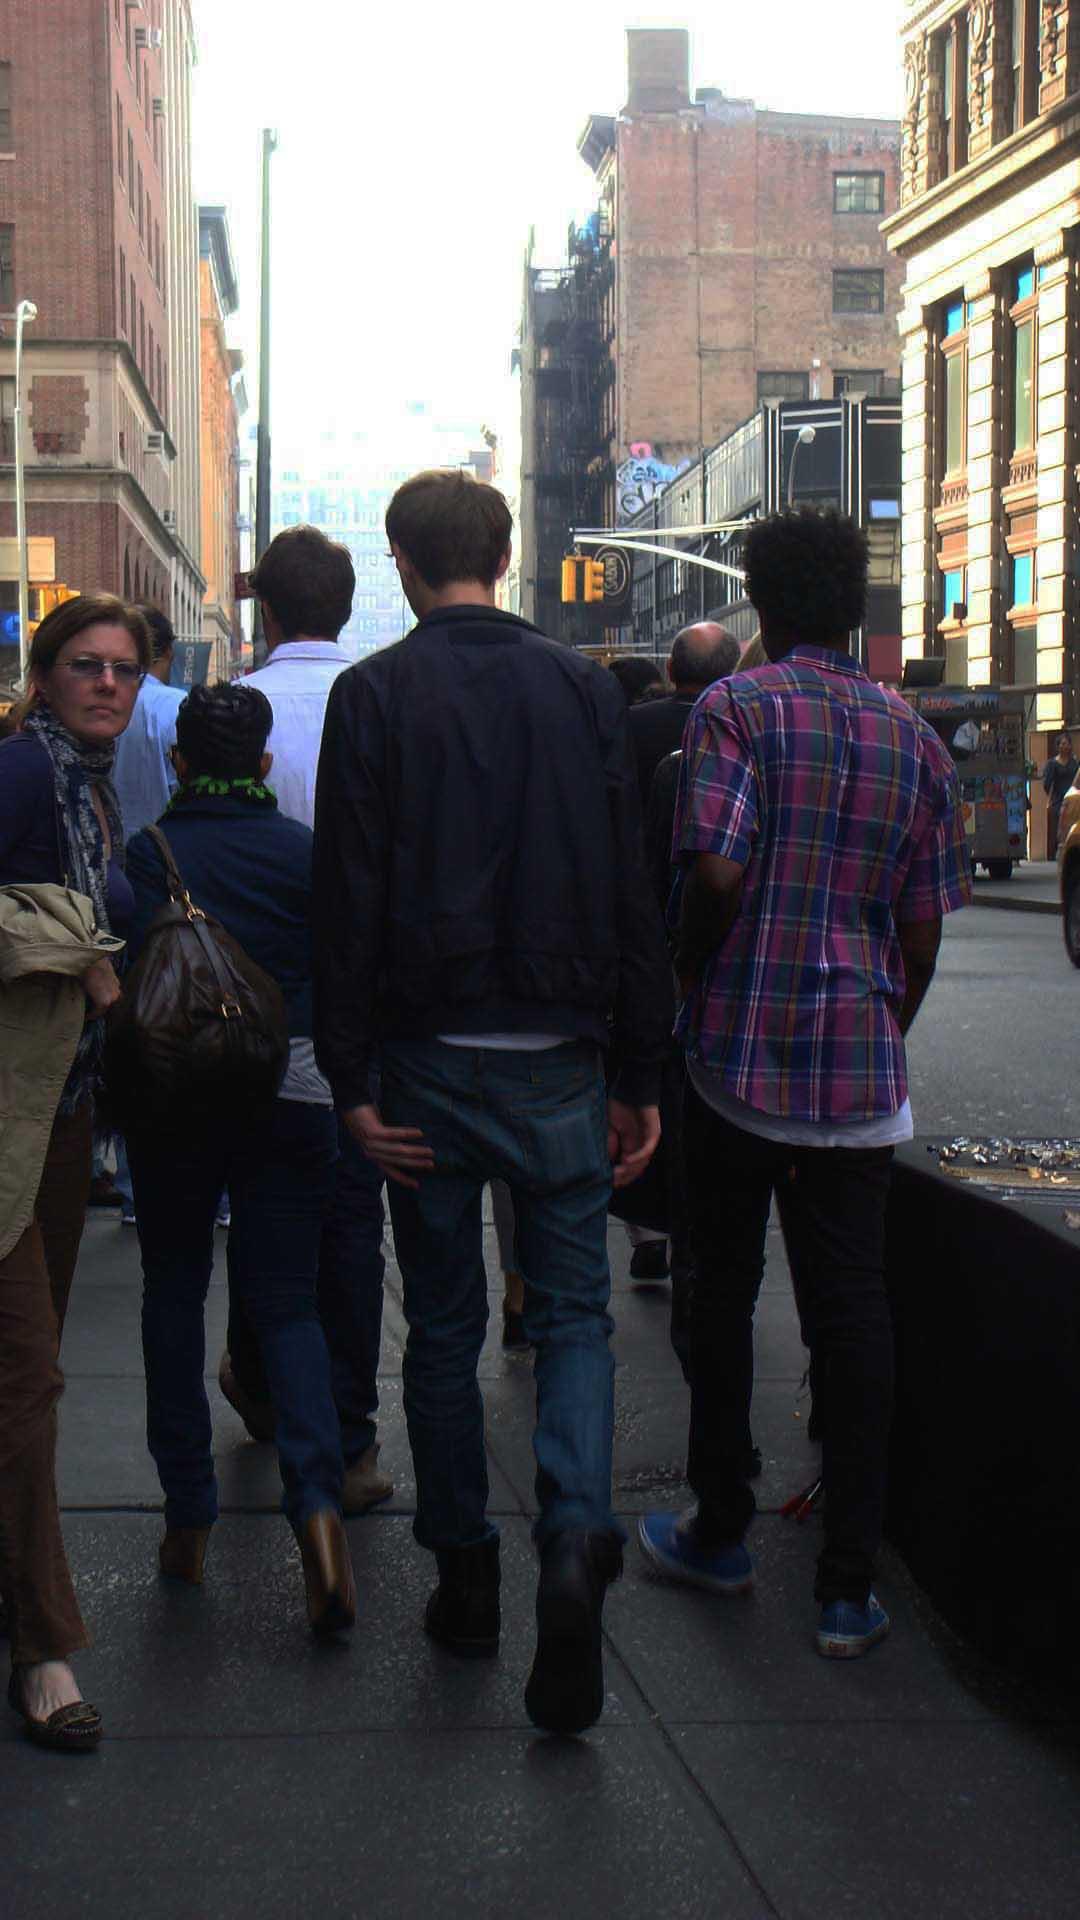 walking (NYC)